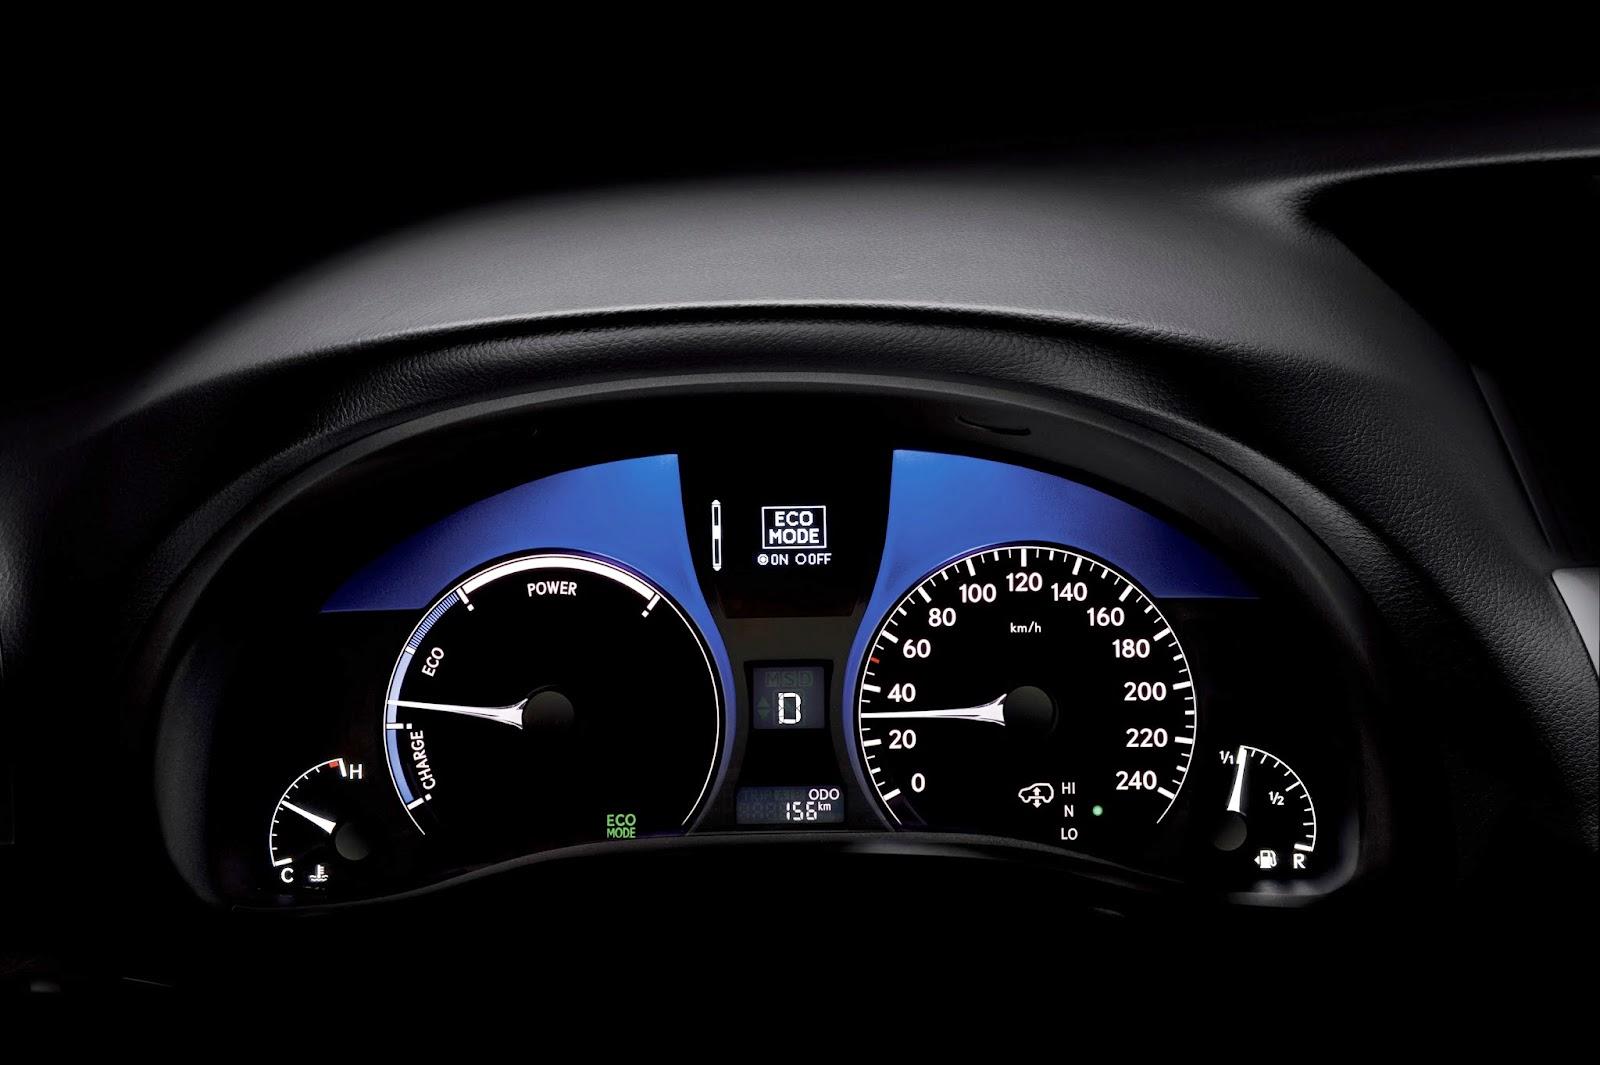 Instrument panel of 2015 Lexus RX 450h